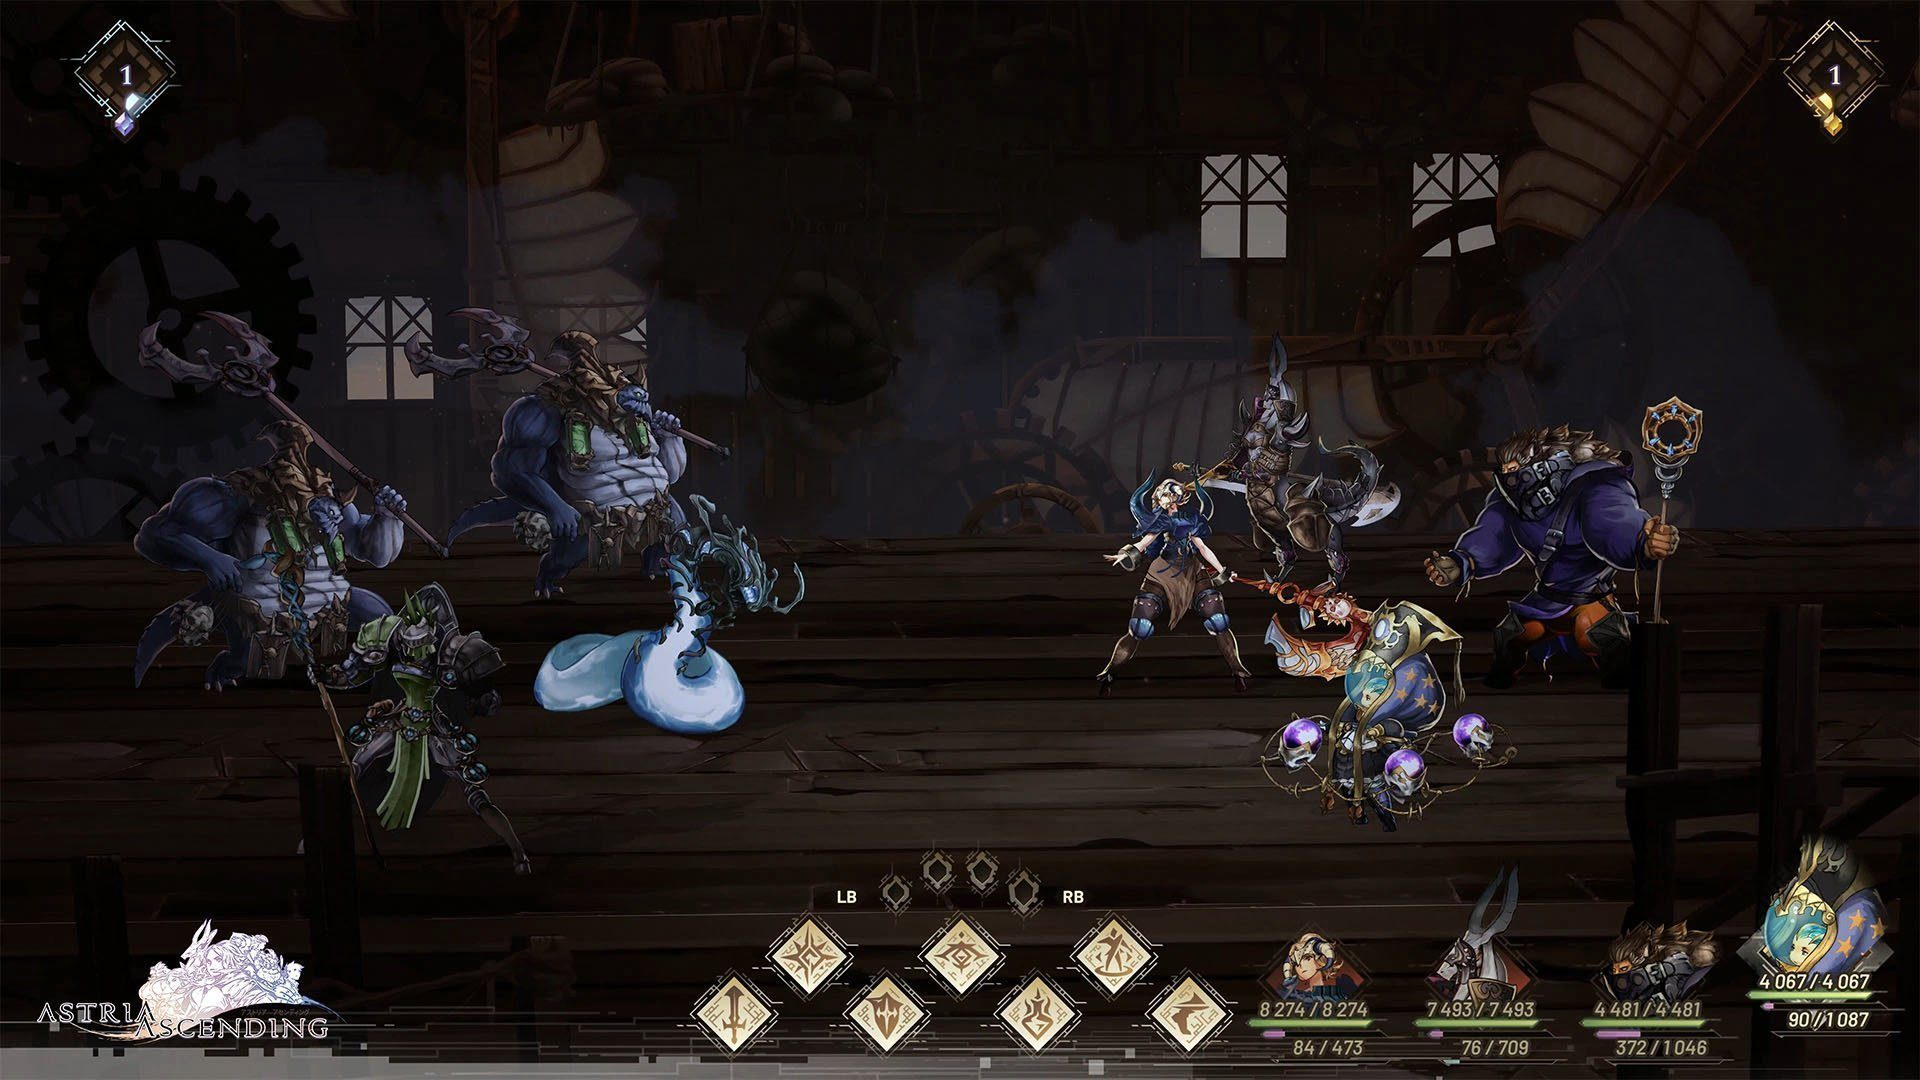 Astria_Ascending_screenshot (3)